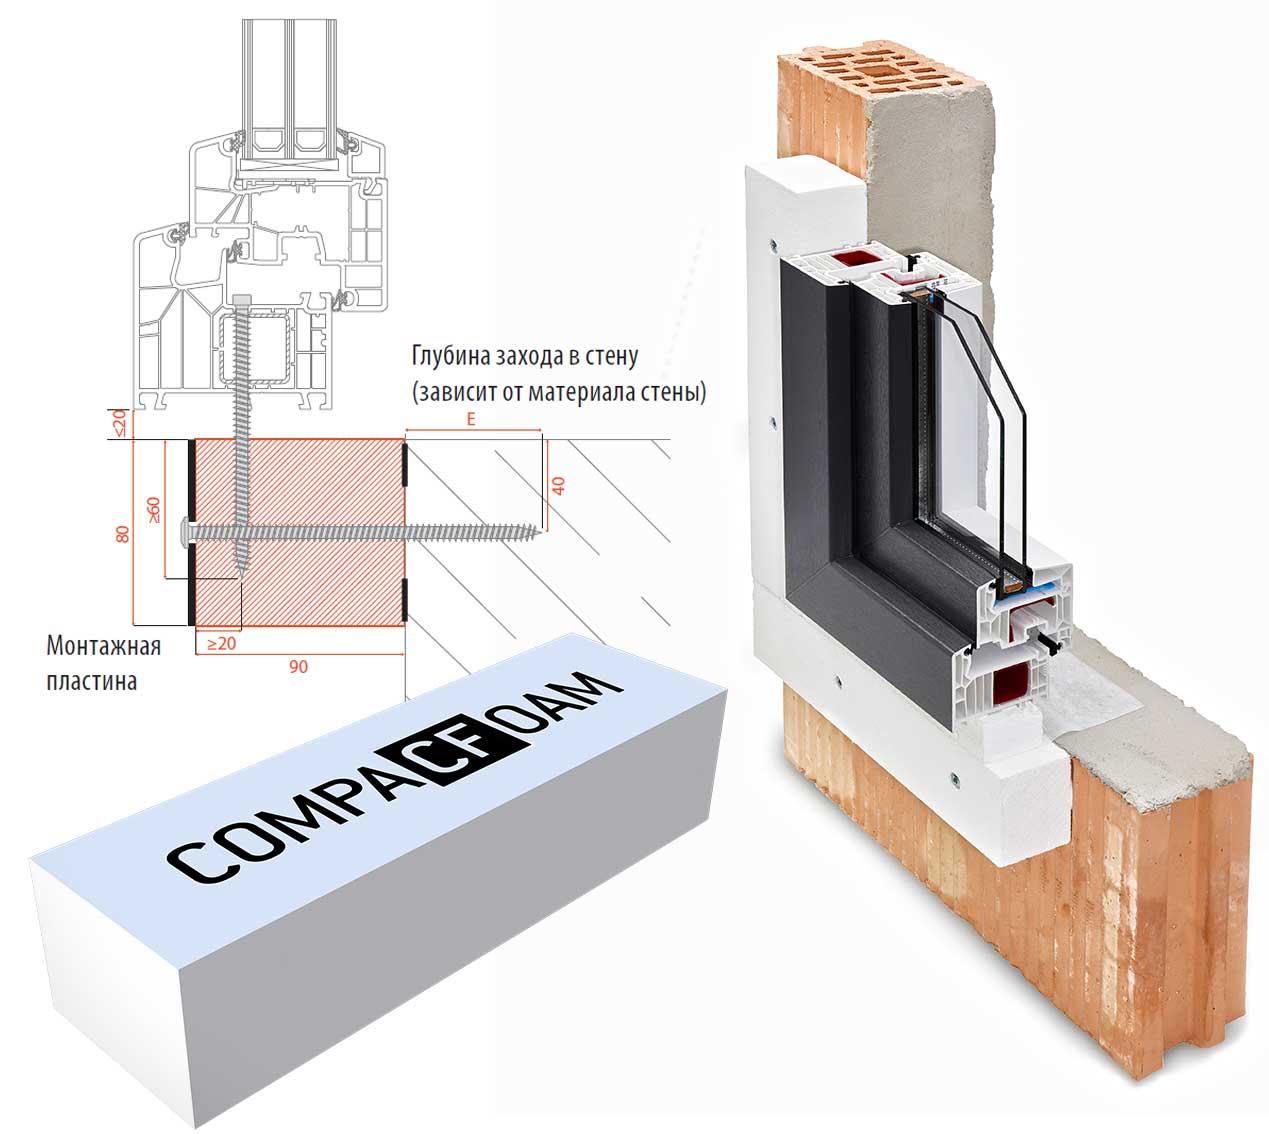 Решение в плотности и тепле материала COMPACFOAM®